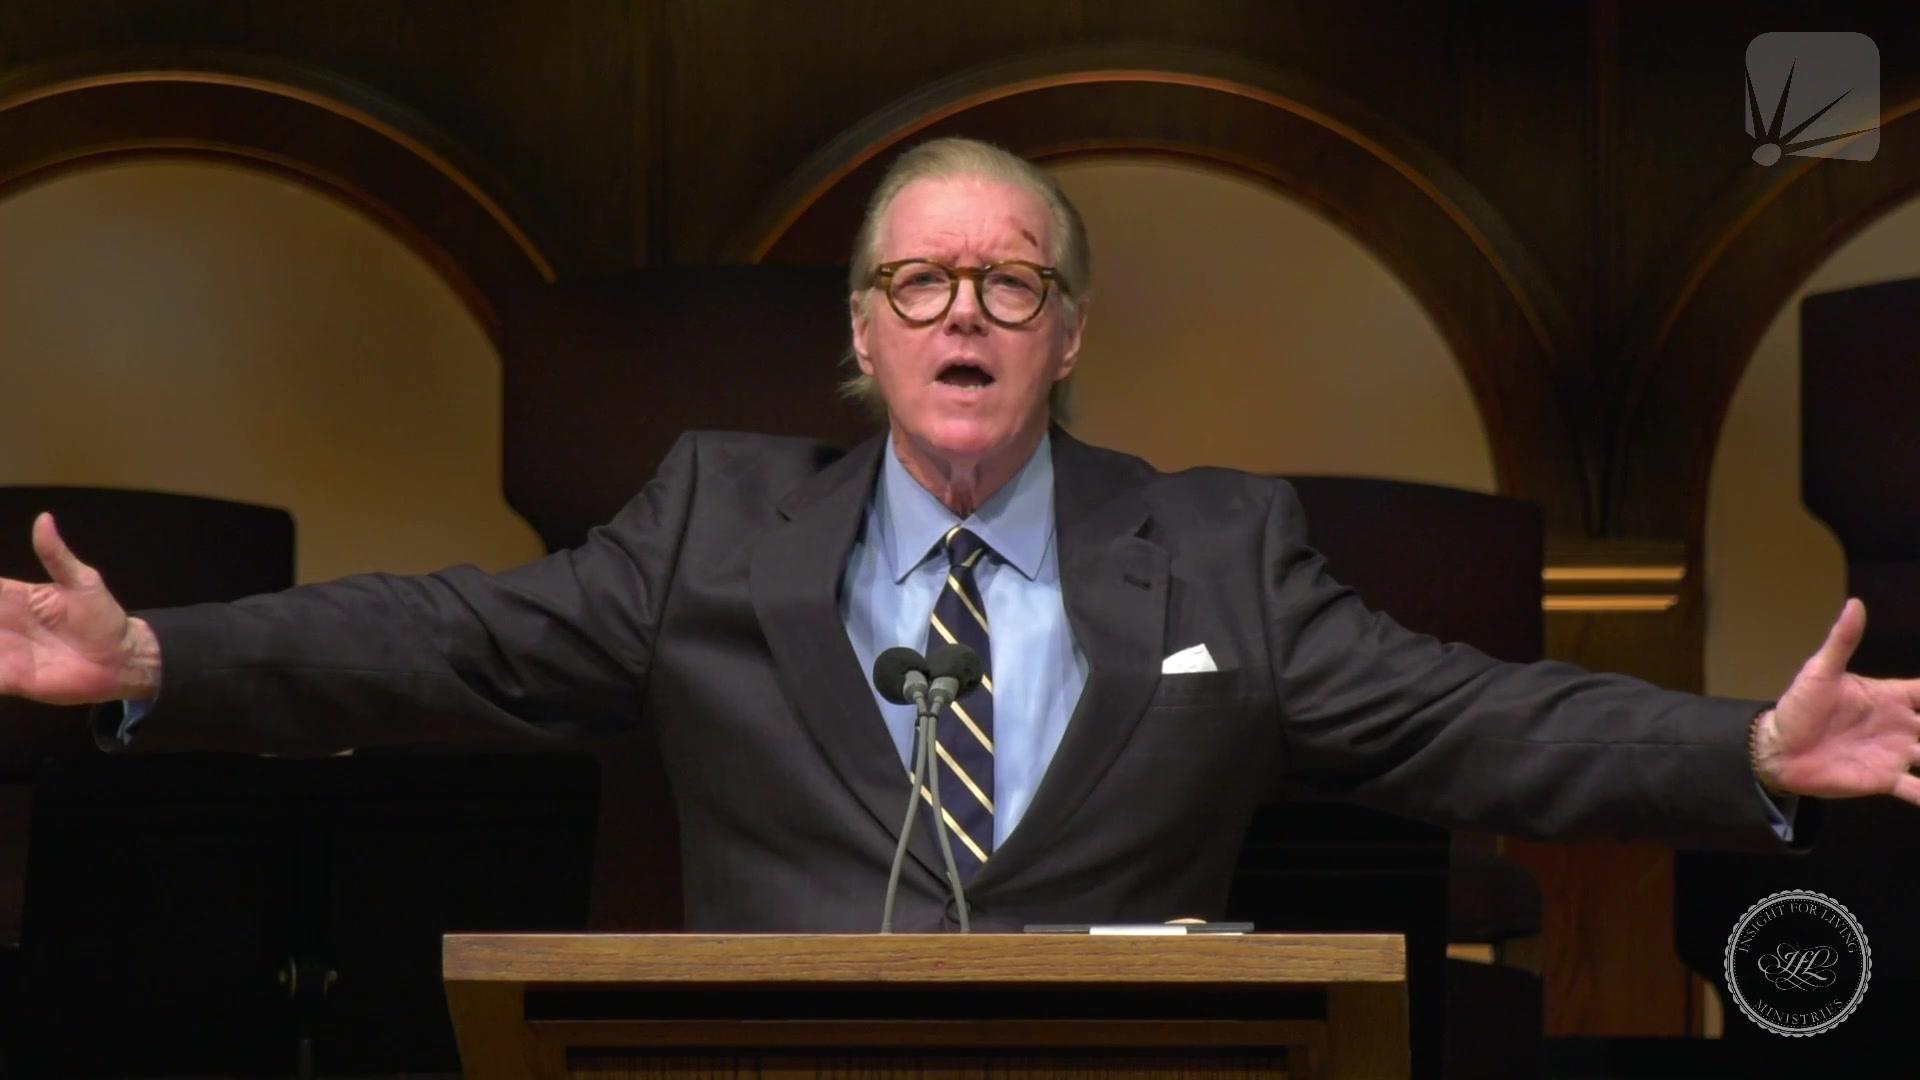 Rev. Bill Butterworth in pulpit on 20210718